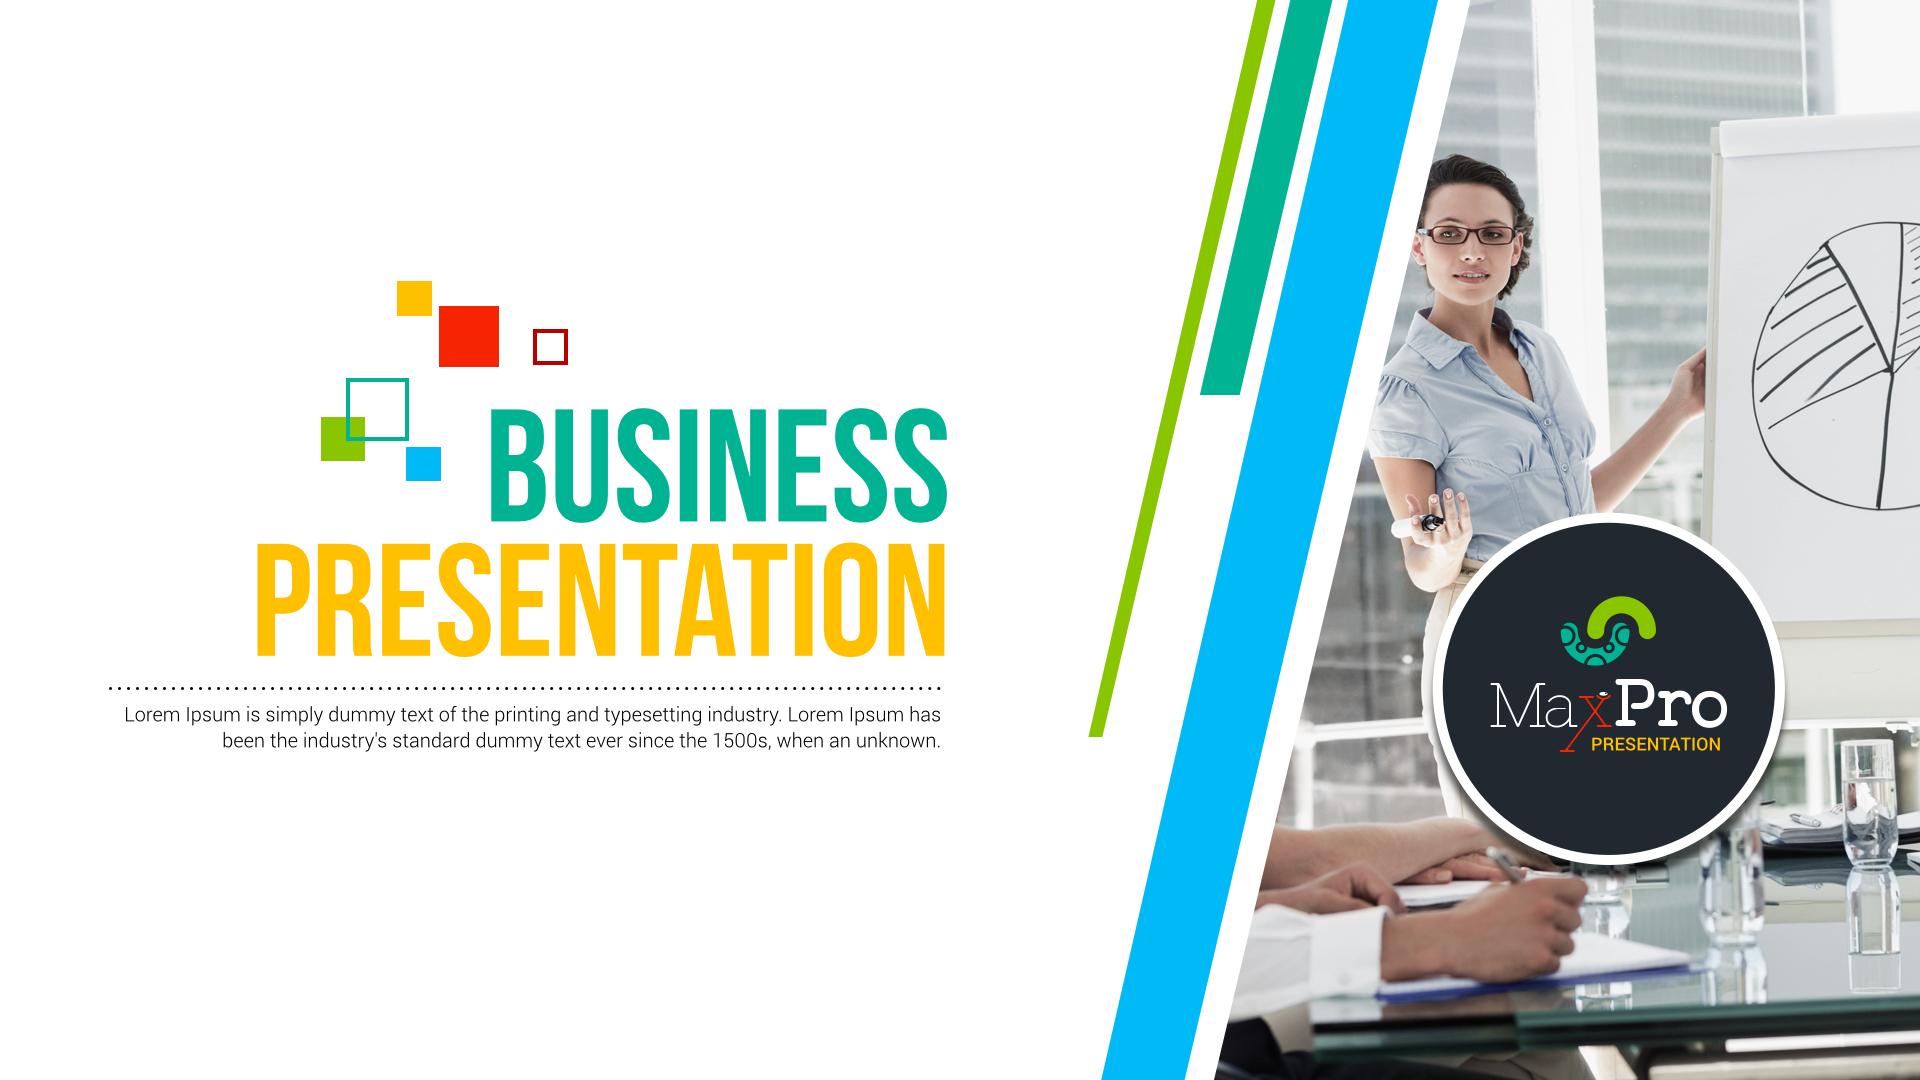 MaxPro Business Plan PowerPoint Presentation by ContestDesign – Business Presentation